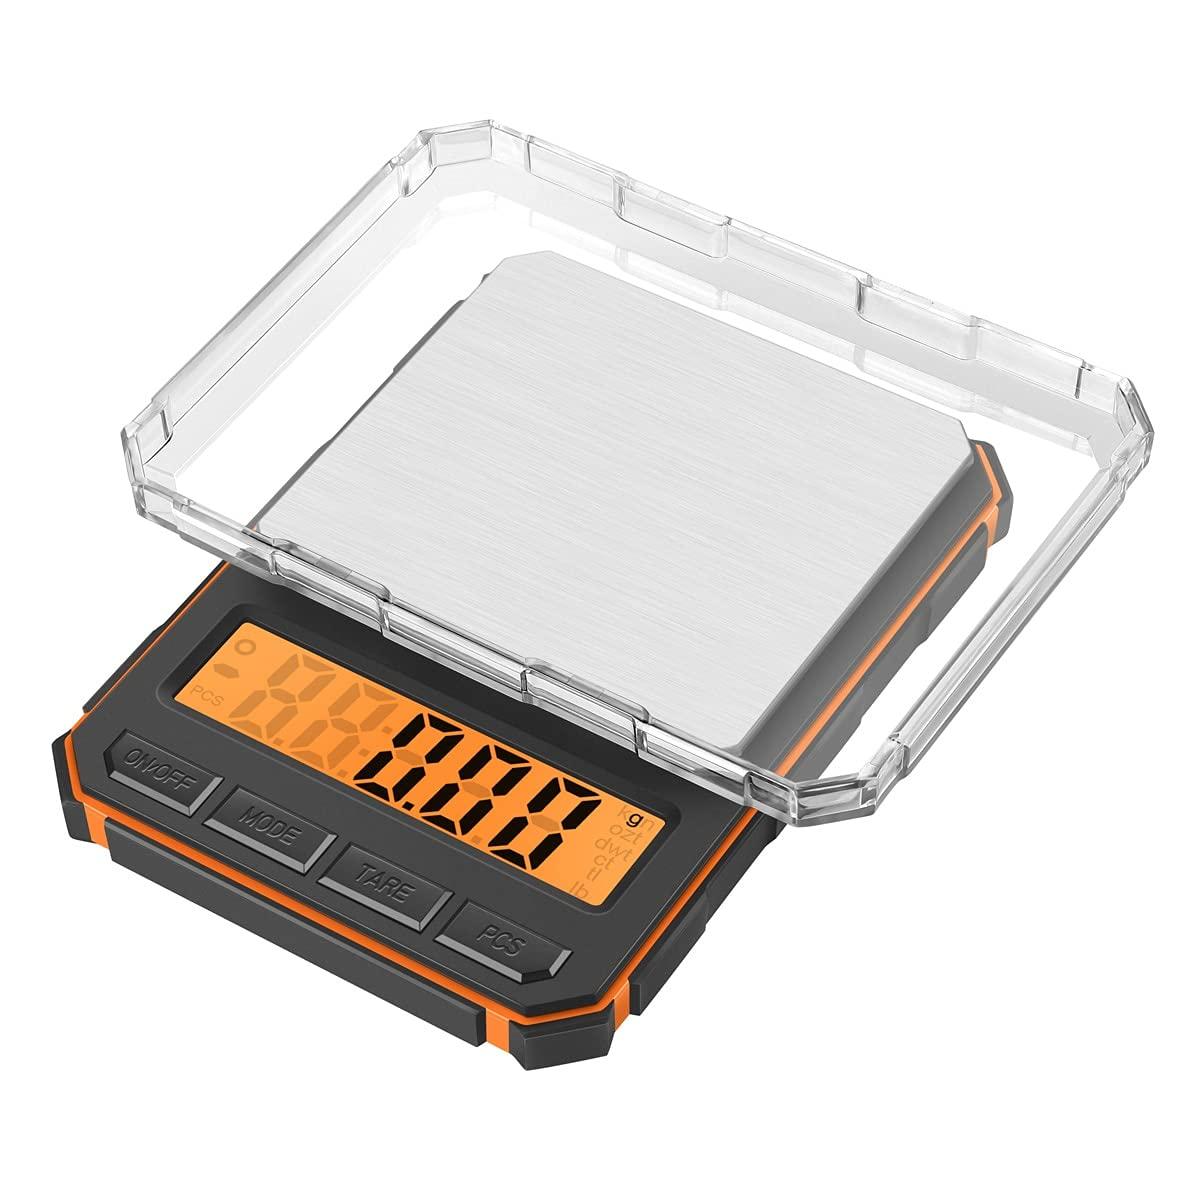 QQWW Max 74% OFF Kitchen Mini Scales High Electronic New mail order Precision Digita